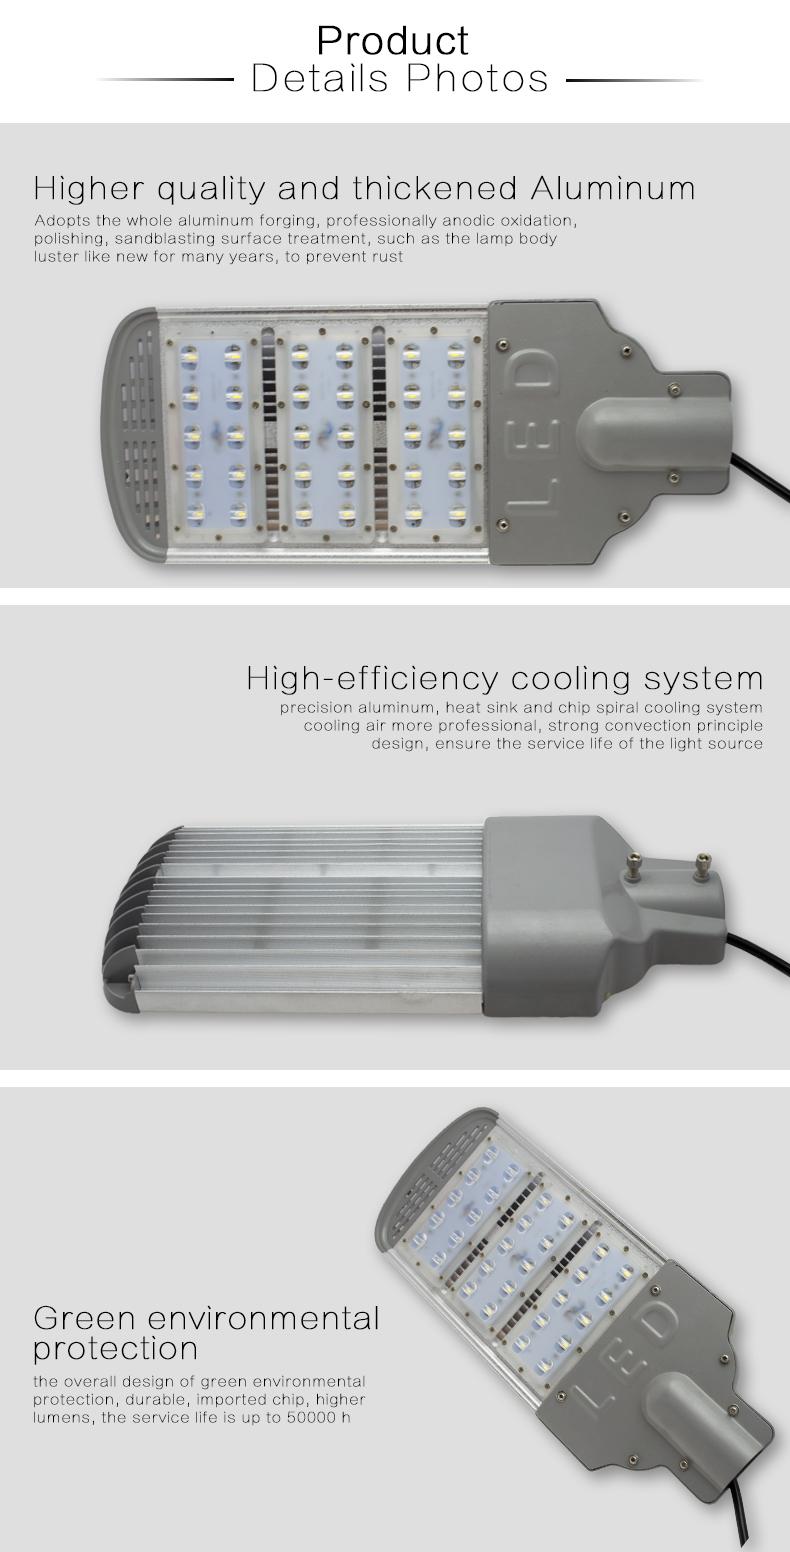 Dongguan LED street light 3 YEARS warranty jiuliang led lamps street